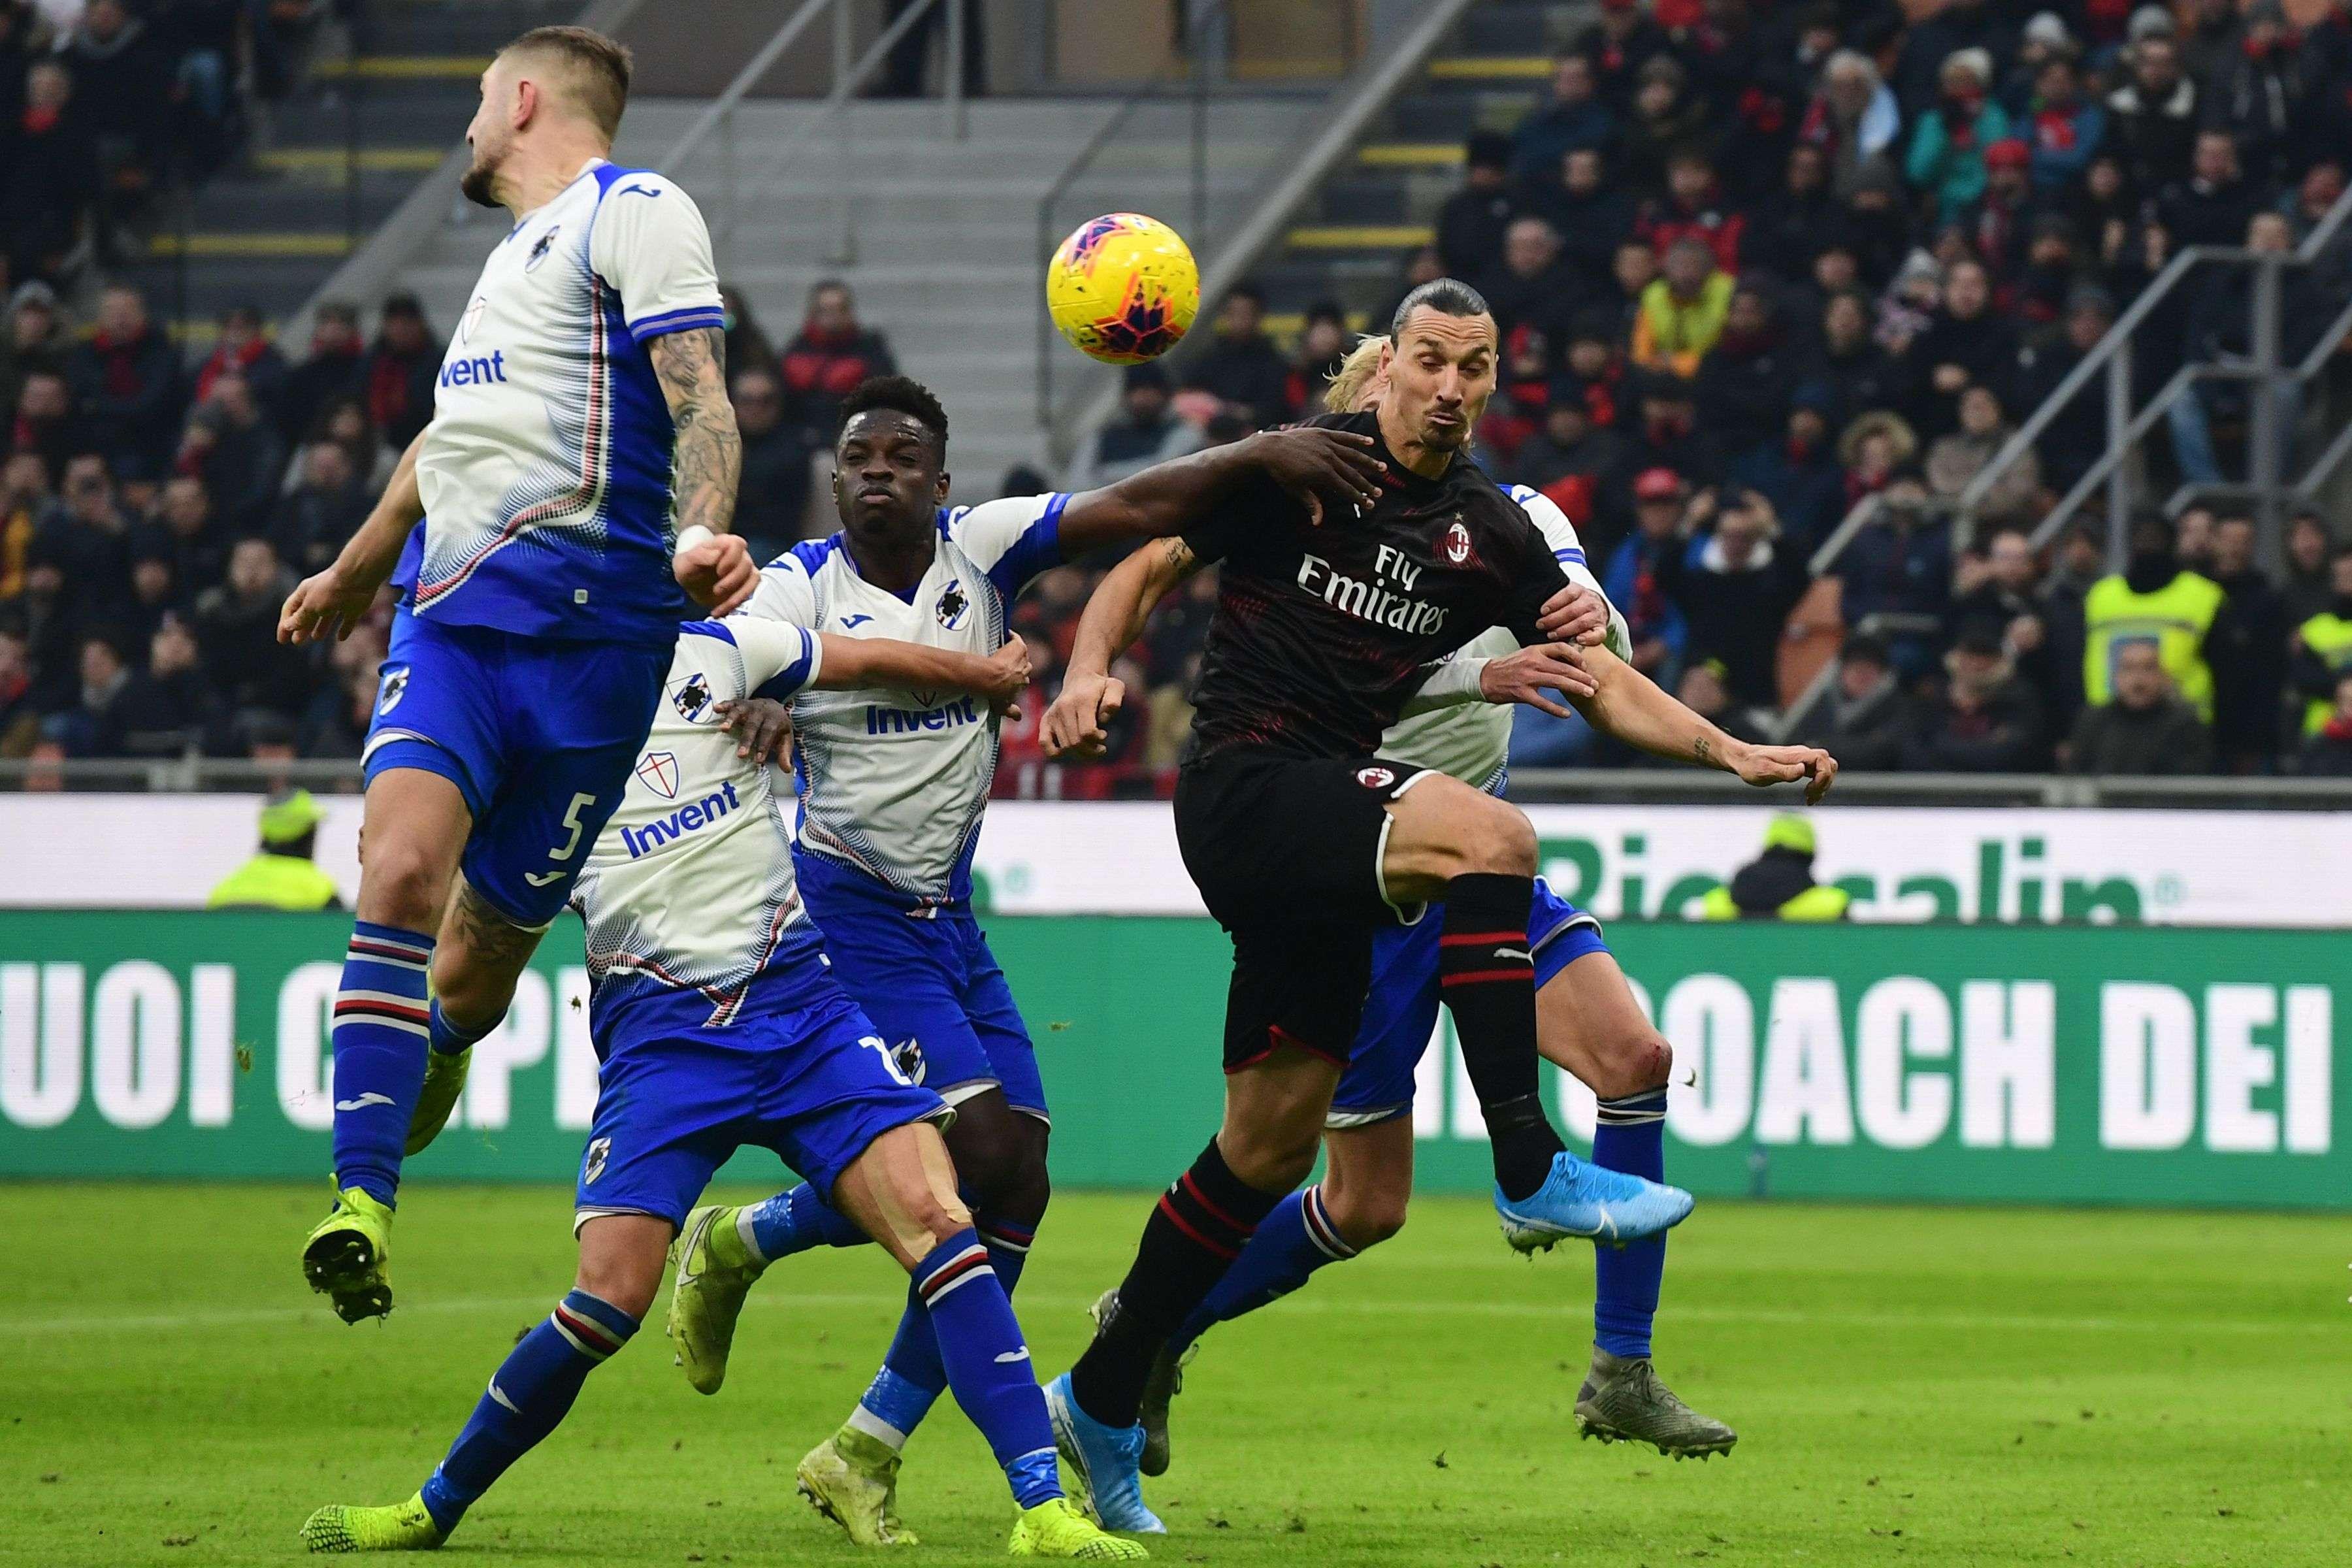 sampdoria vs fiorentina betting preview on betfair